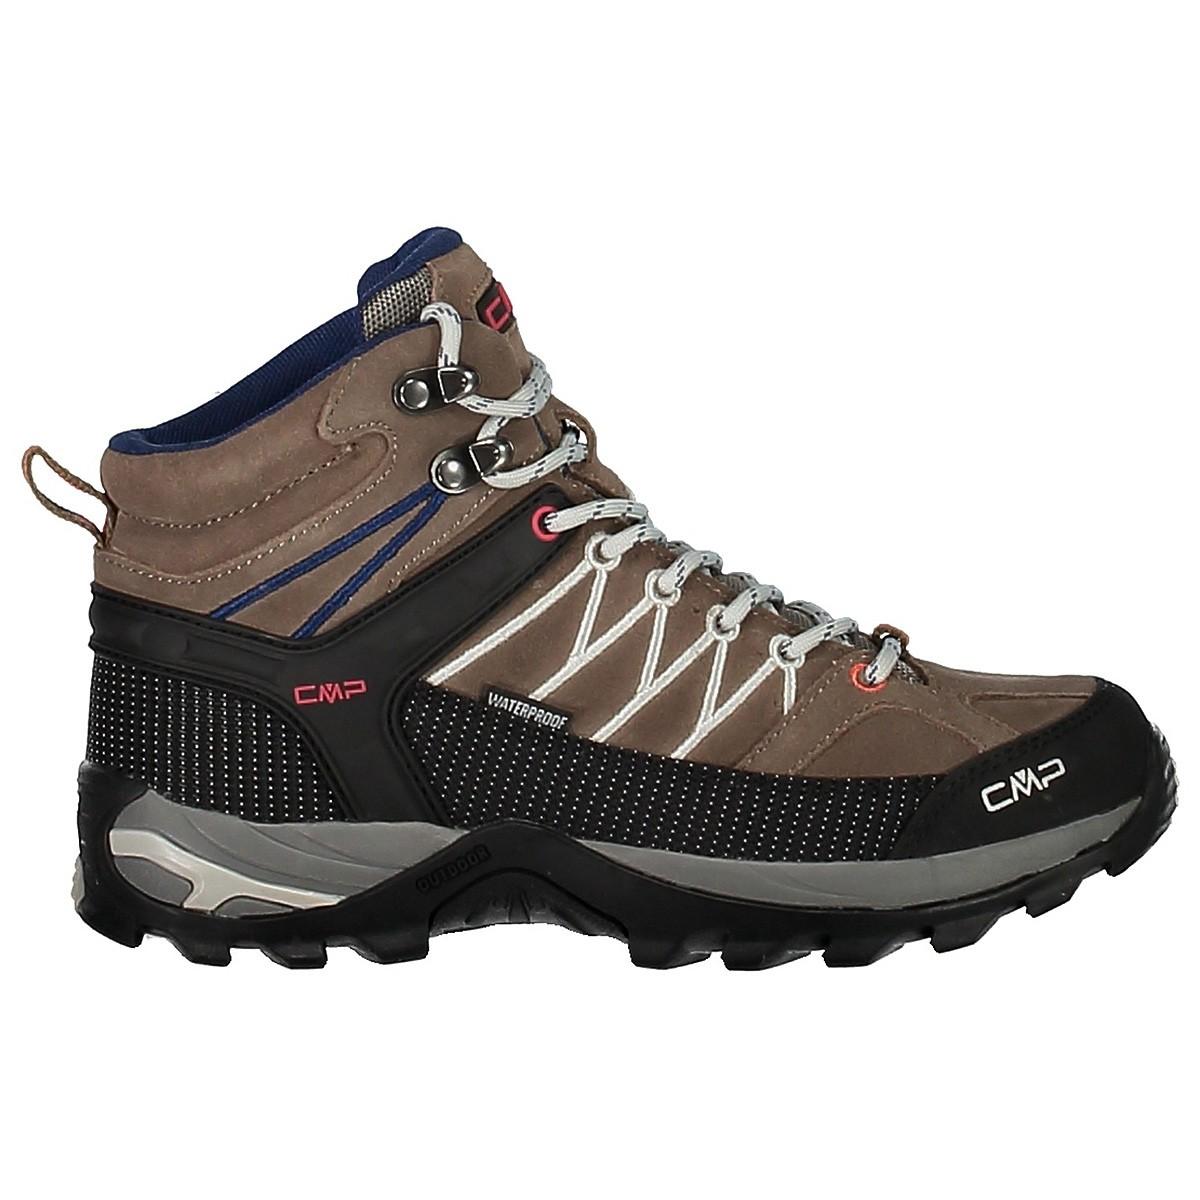 chaussure cmp rigel mid femme chaussures montagne et trekking. Black Bedroom Furniture Sets. Home Design Ideas